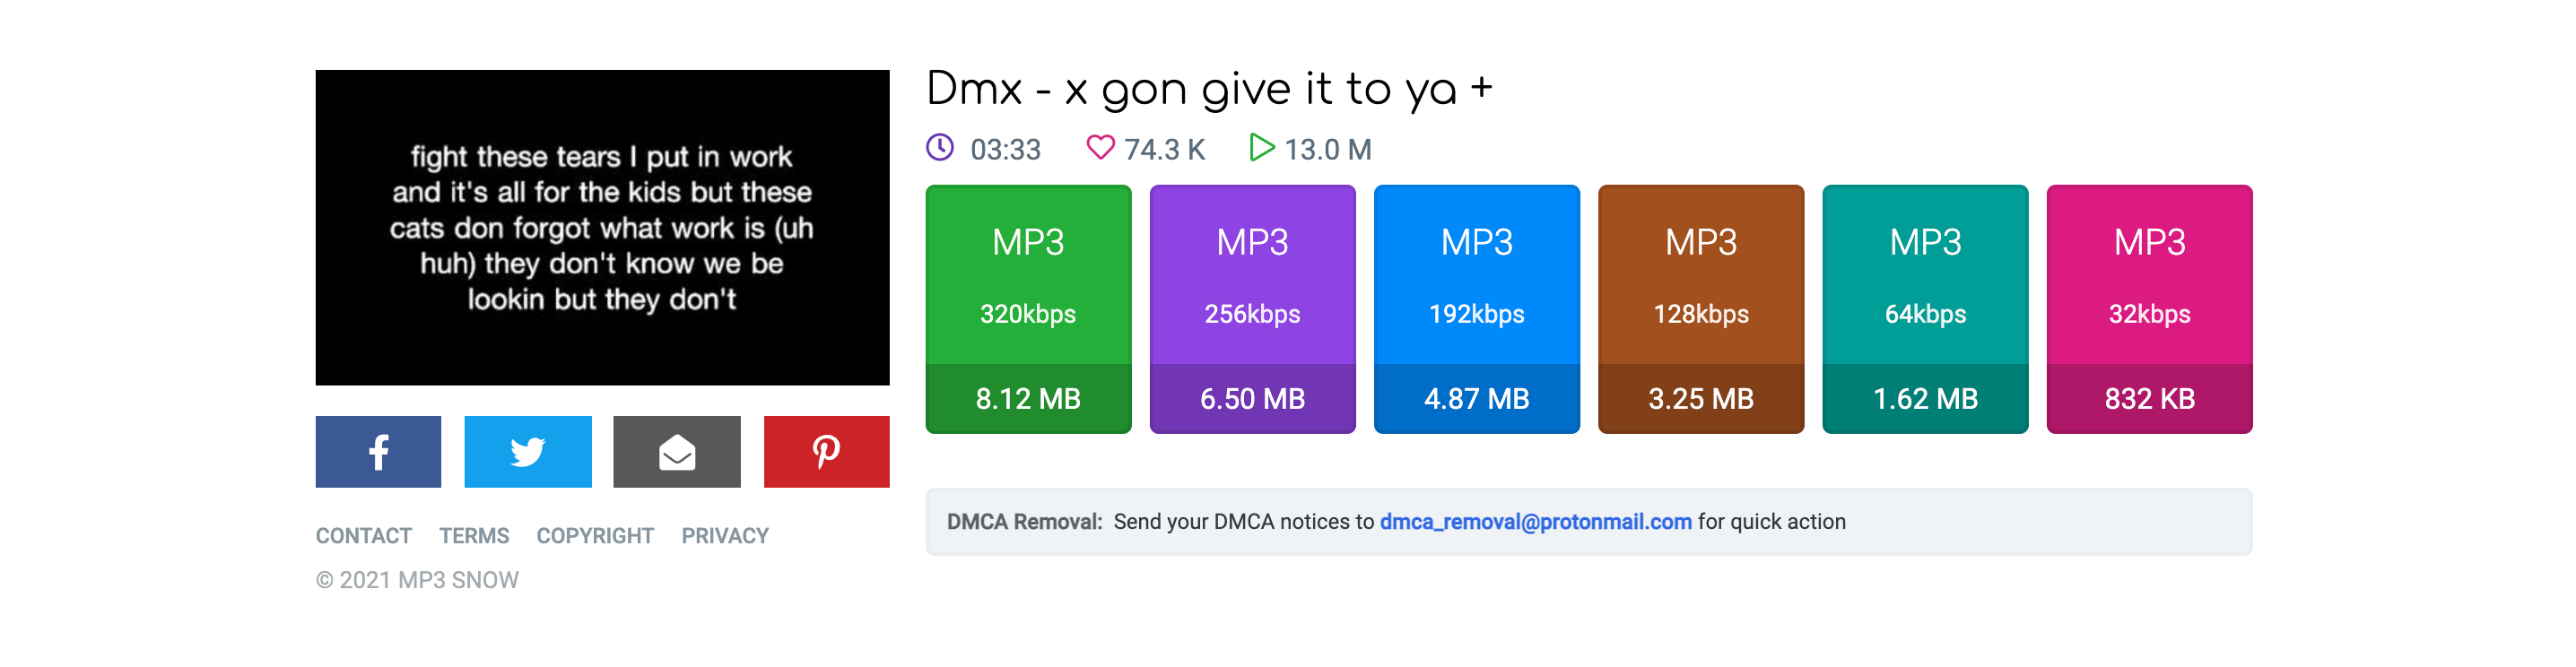 MP3 PAW free mp3 music